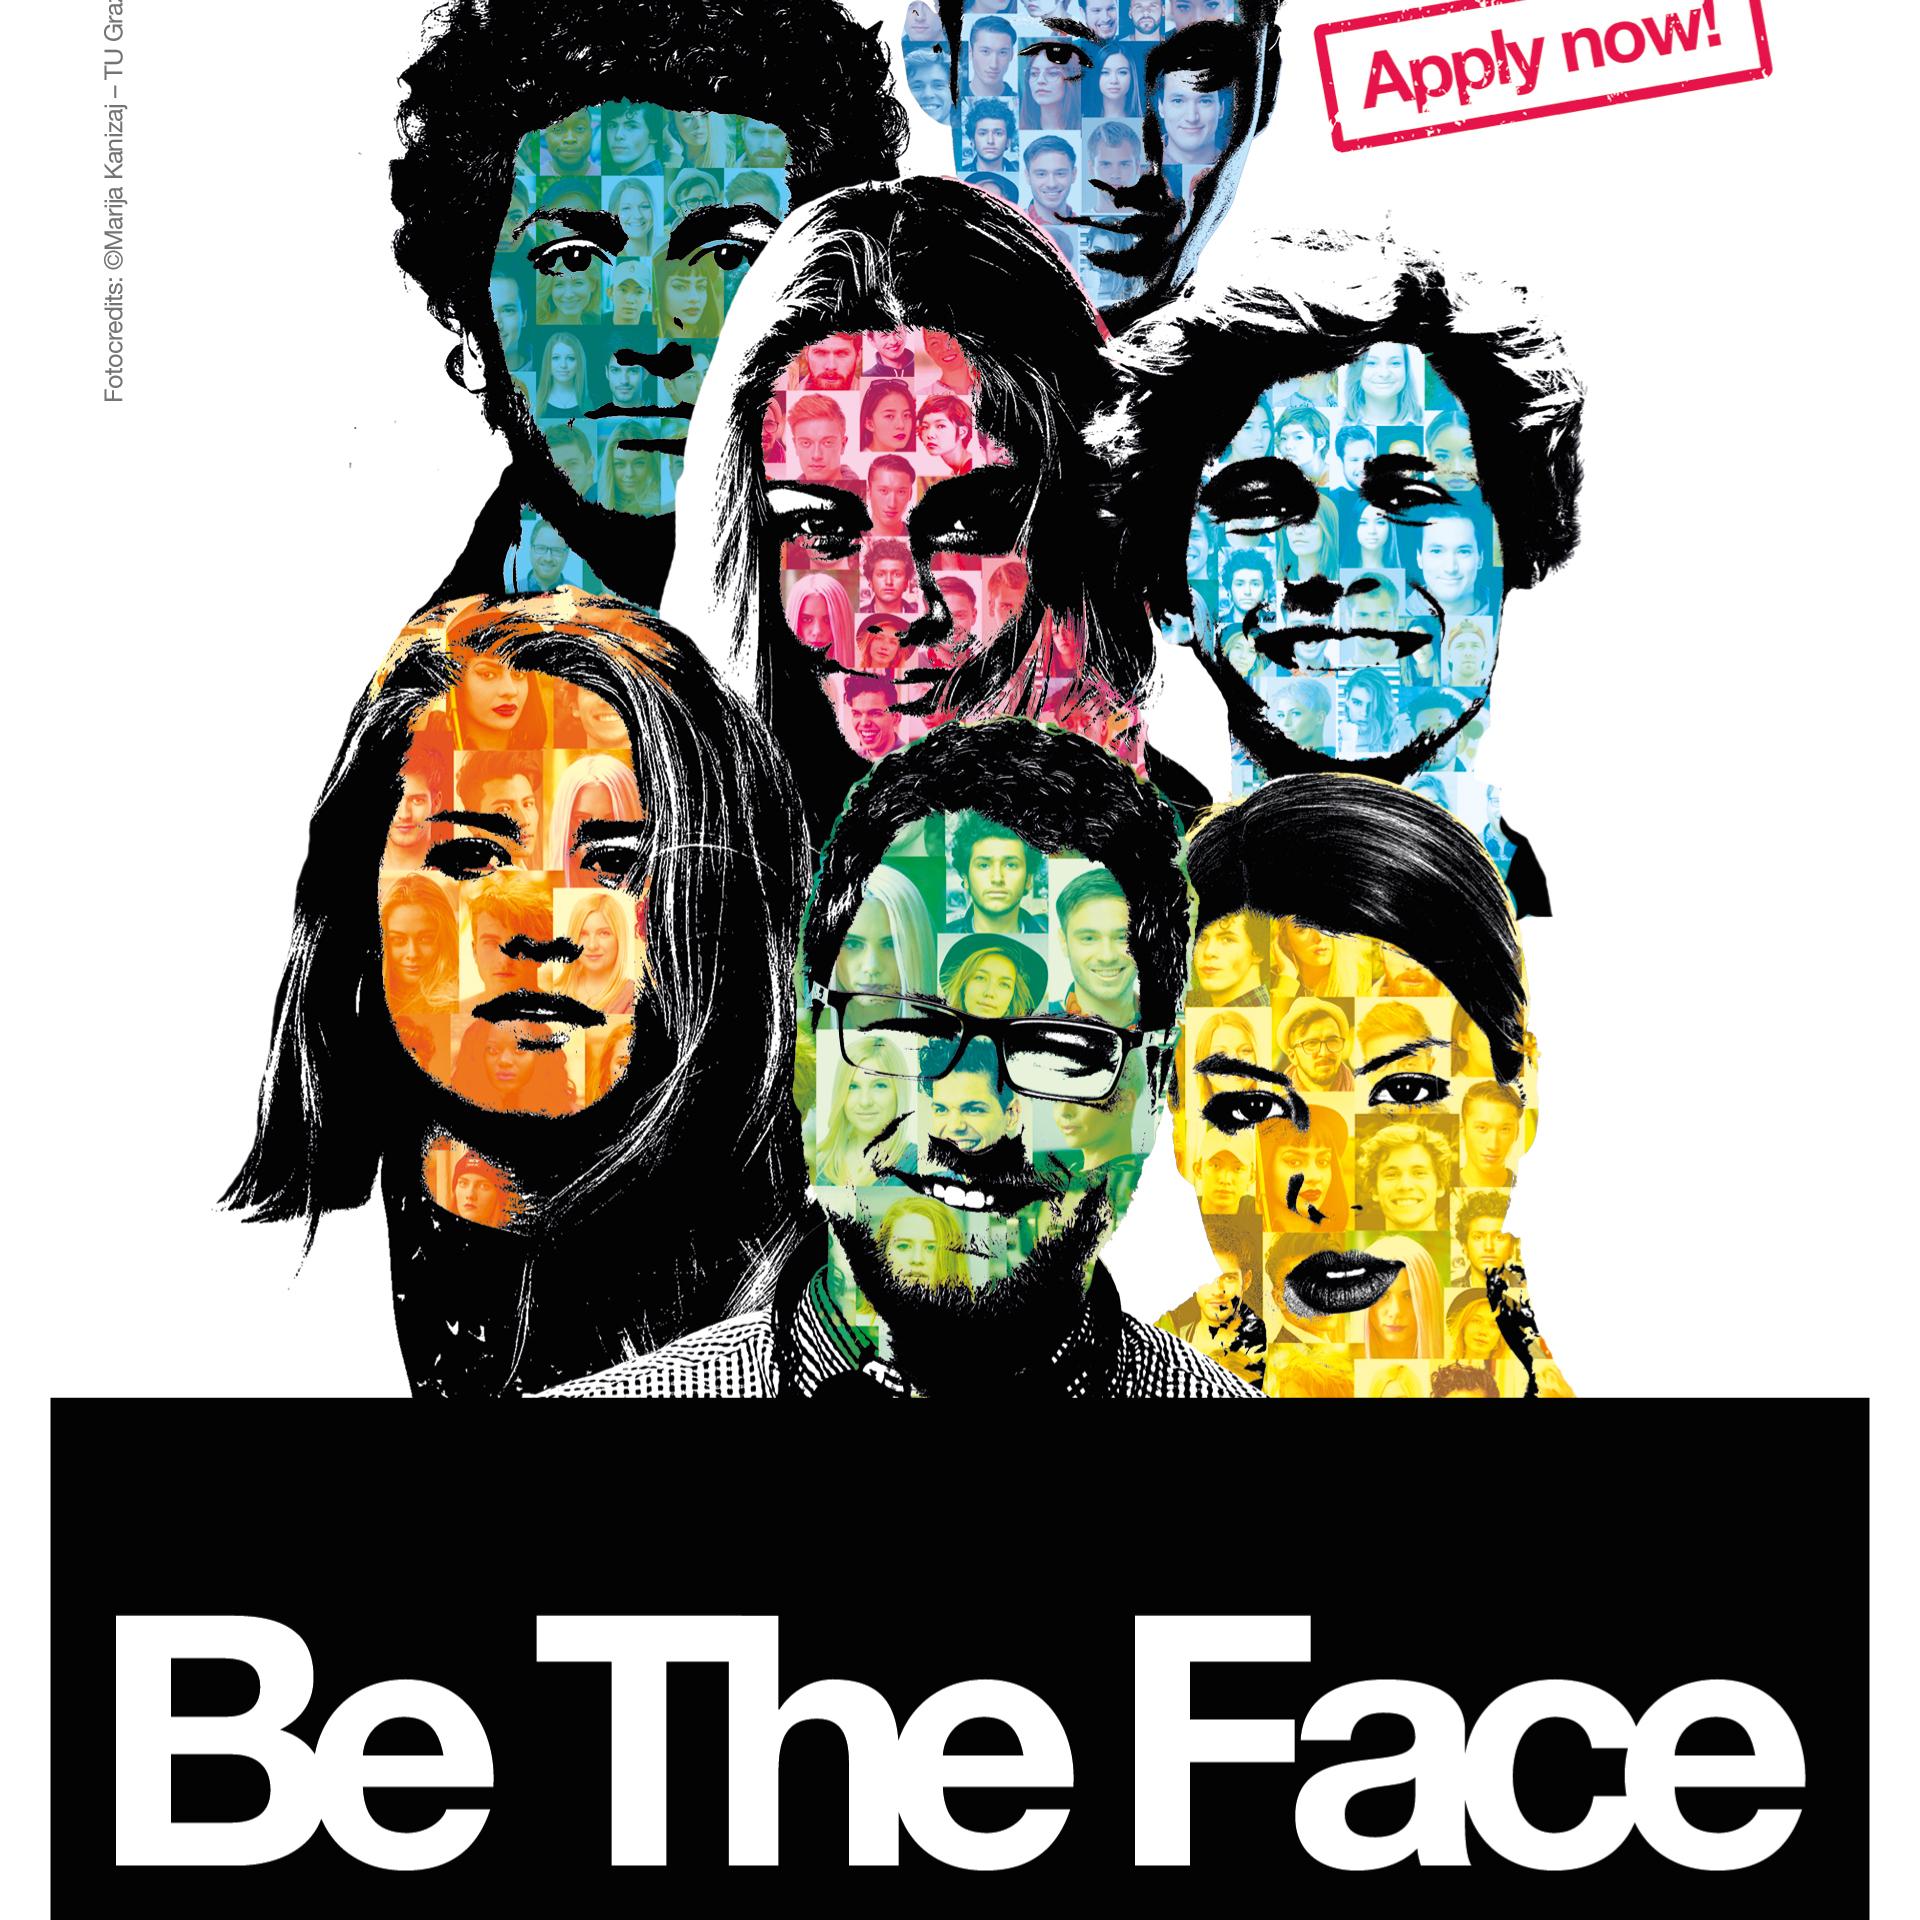 Sei das Gesicht der TU Graz